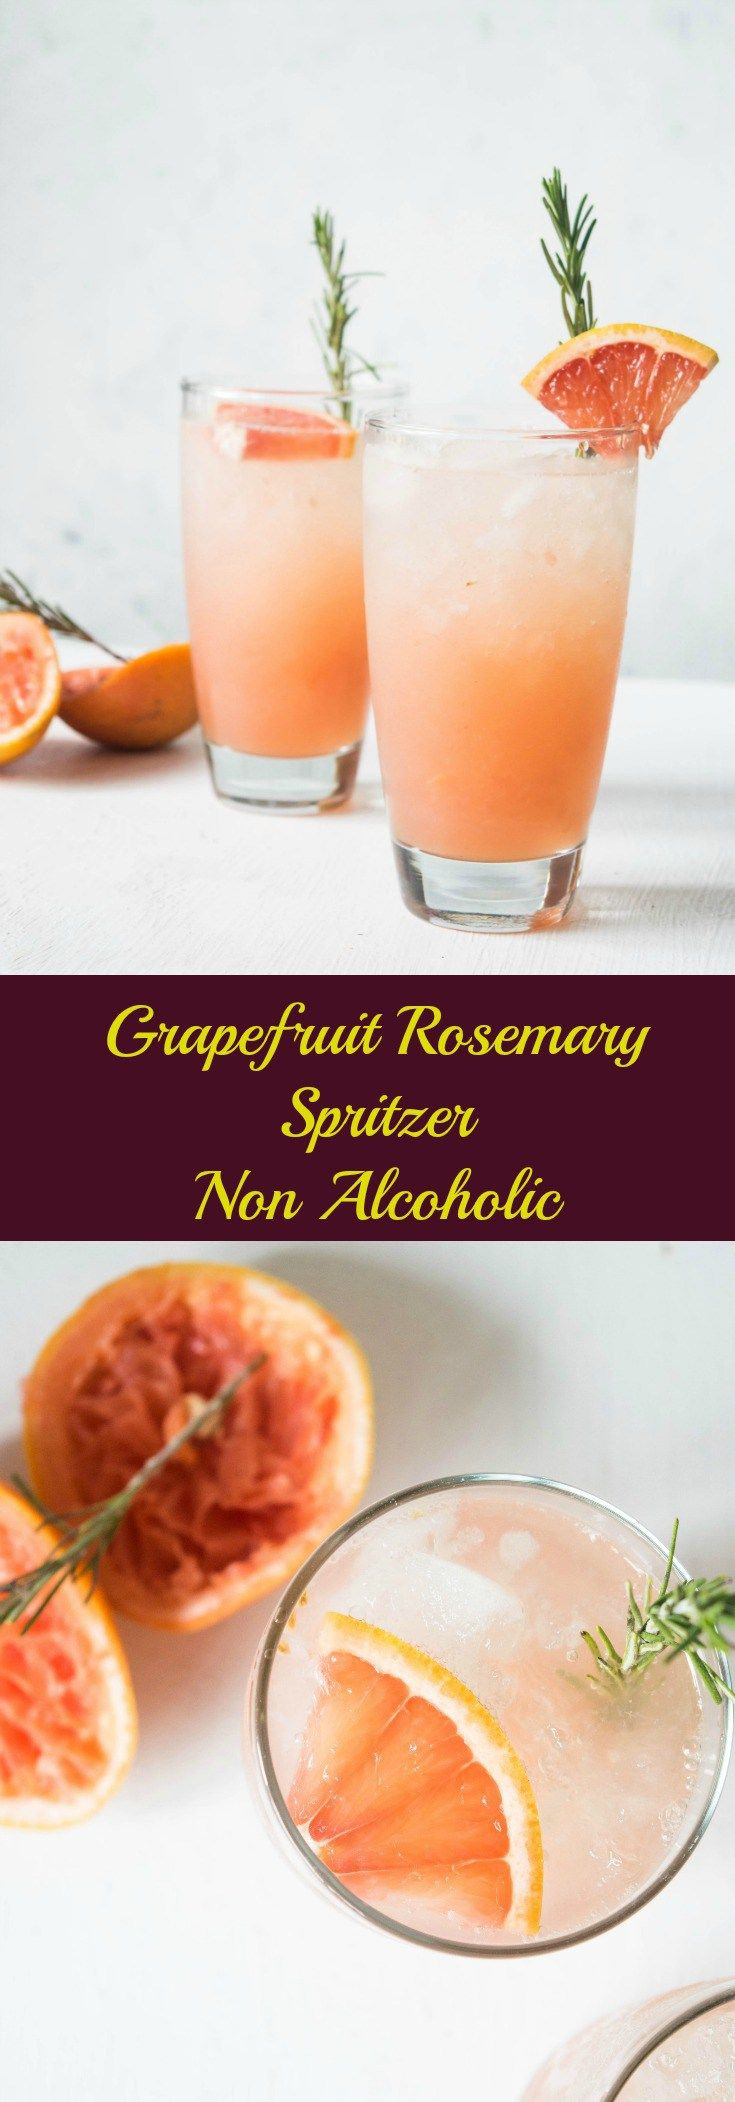 Grapefruit rosemary spritzer